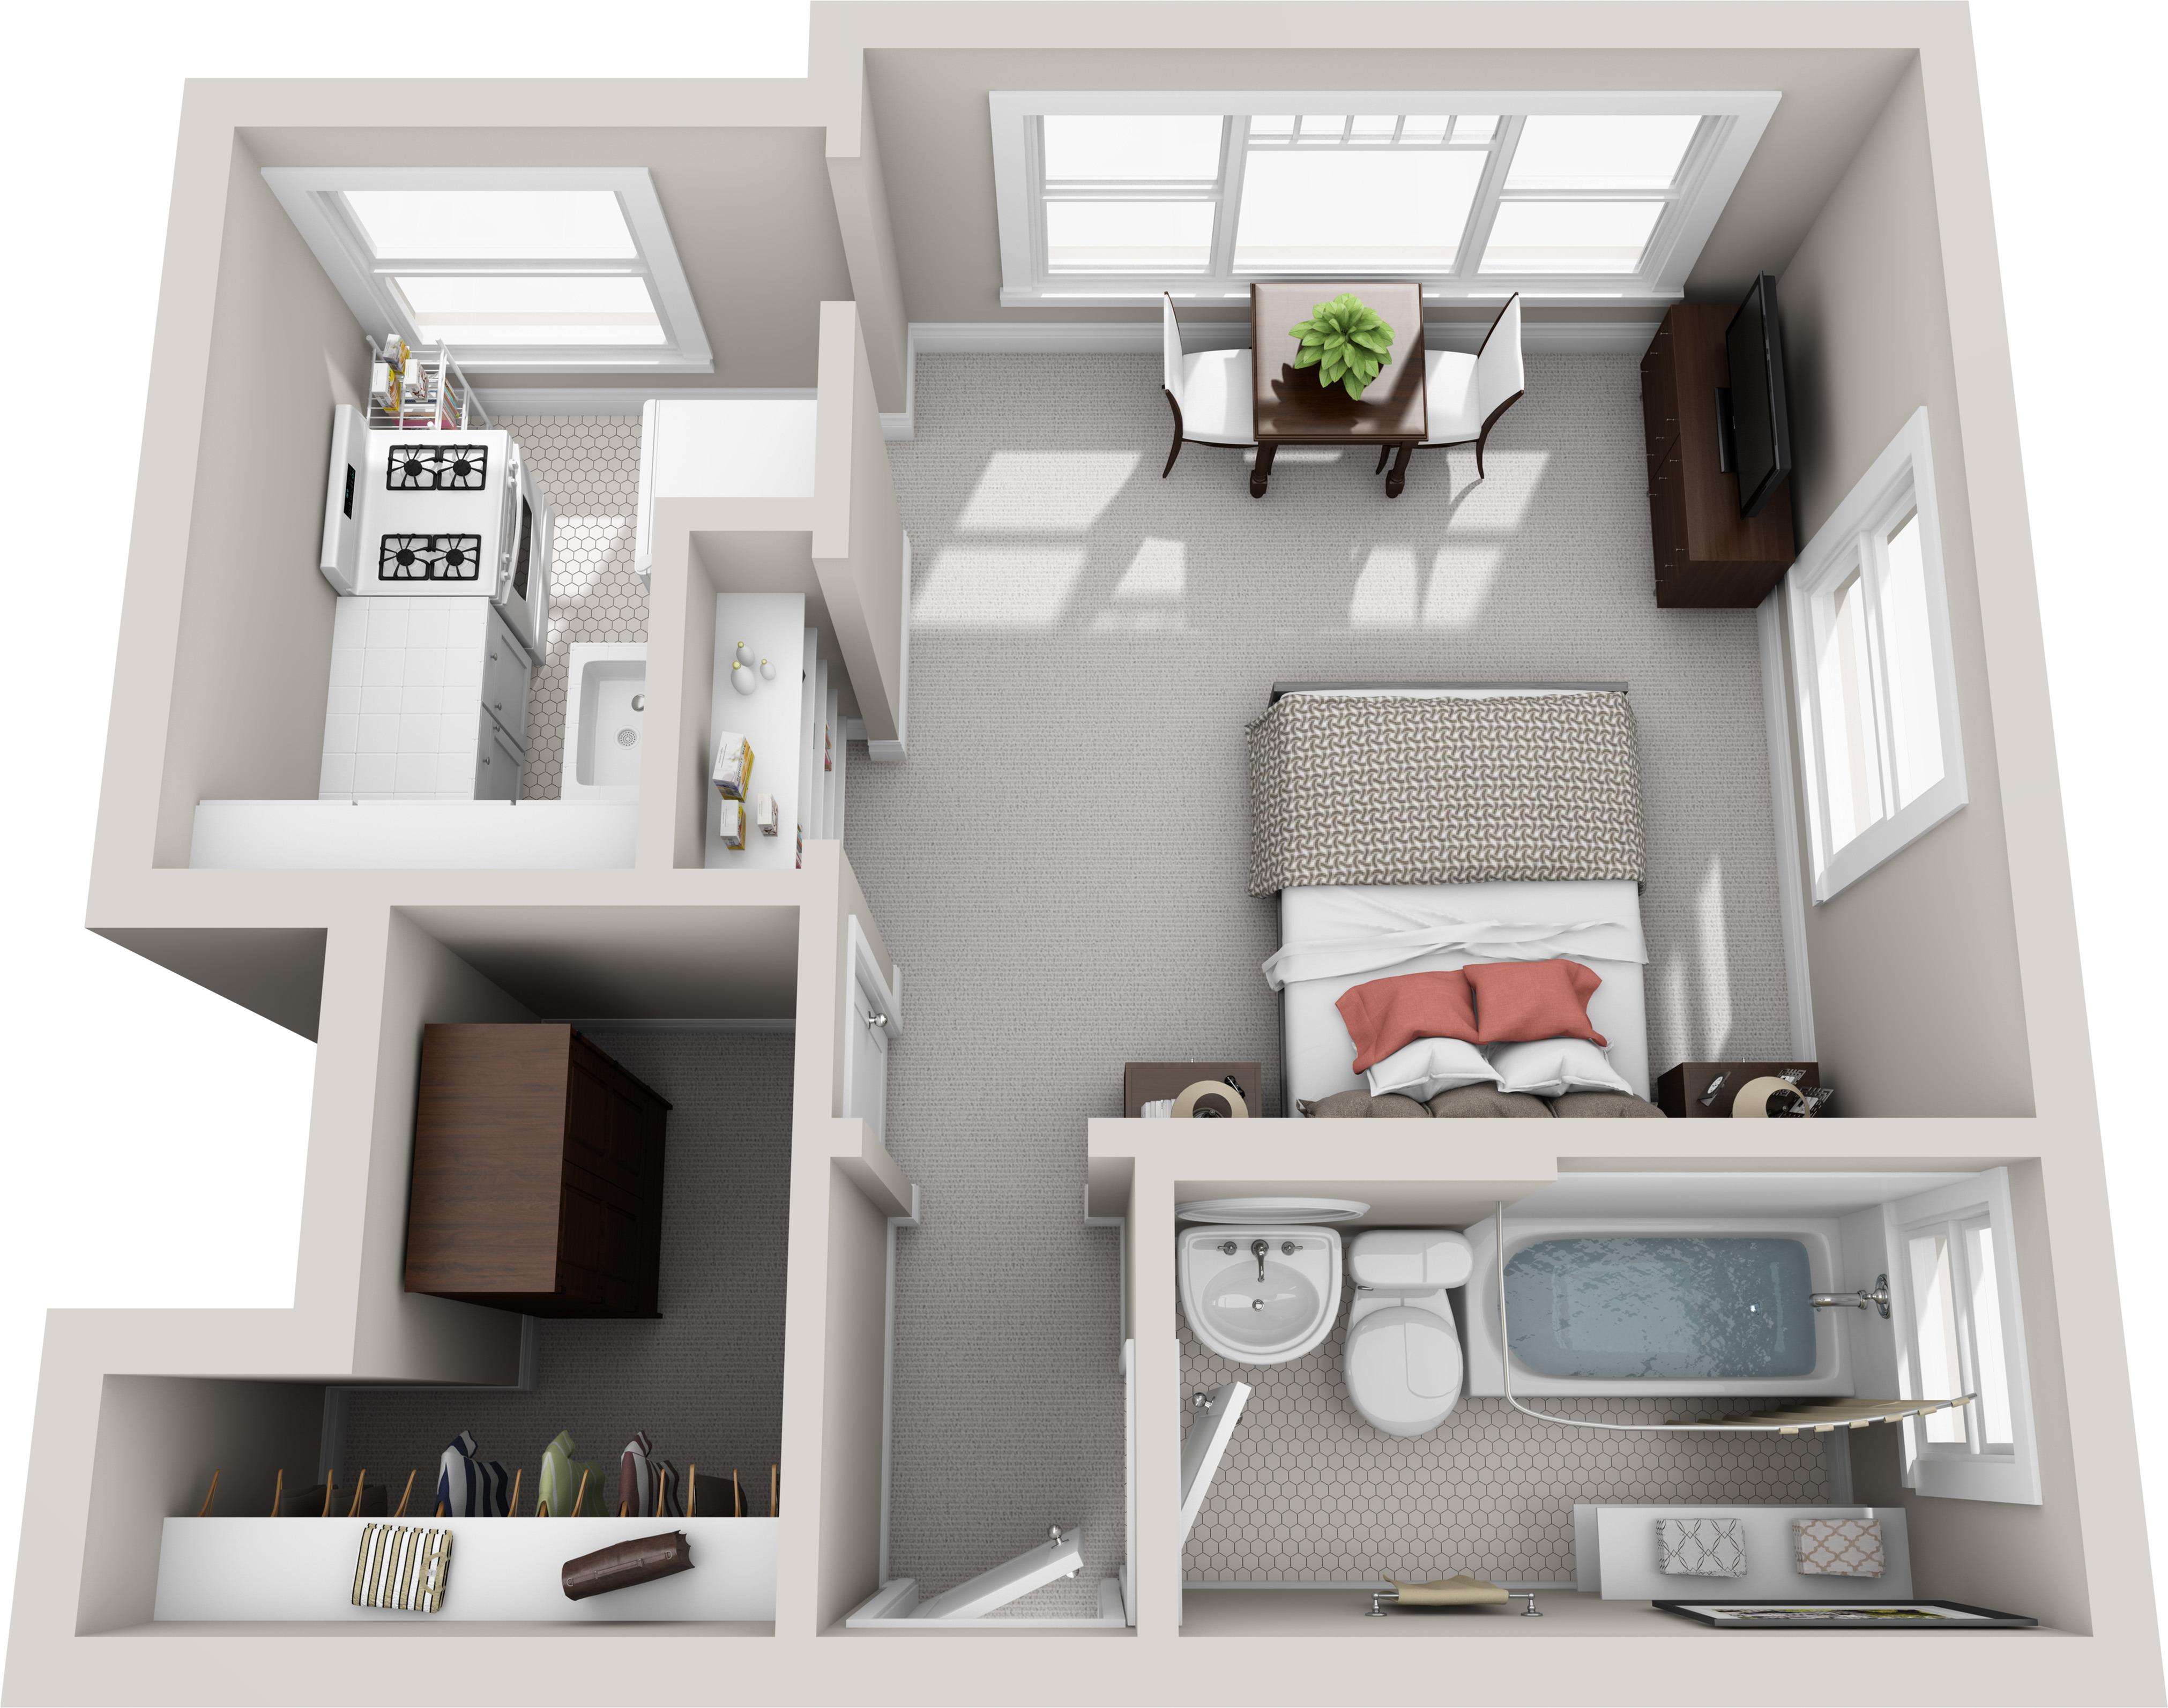 Studio 1 Bath Apartment in San Diego CA